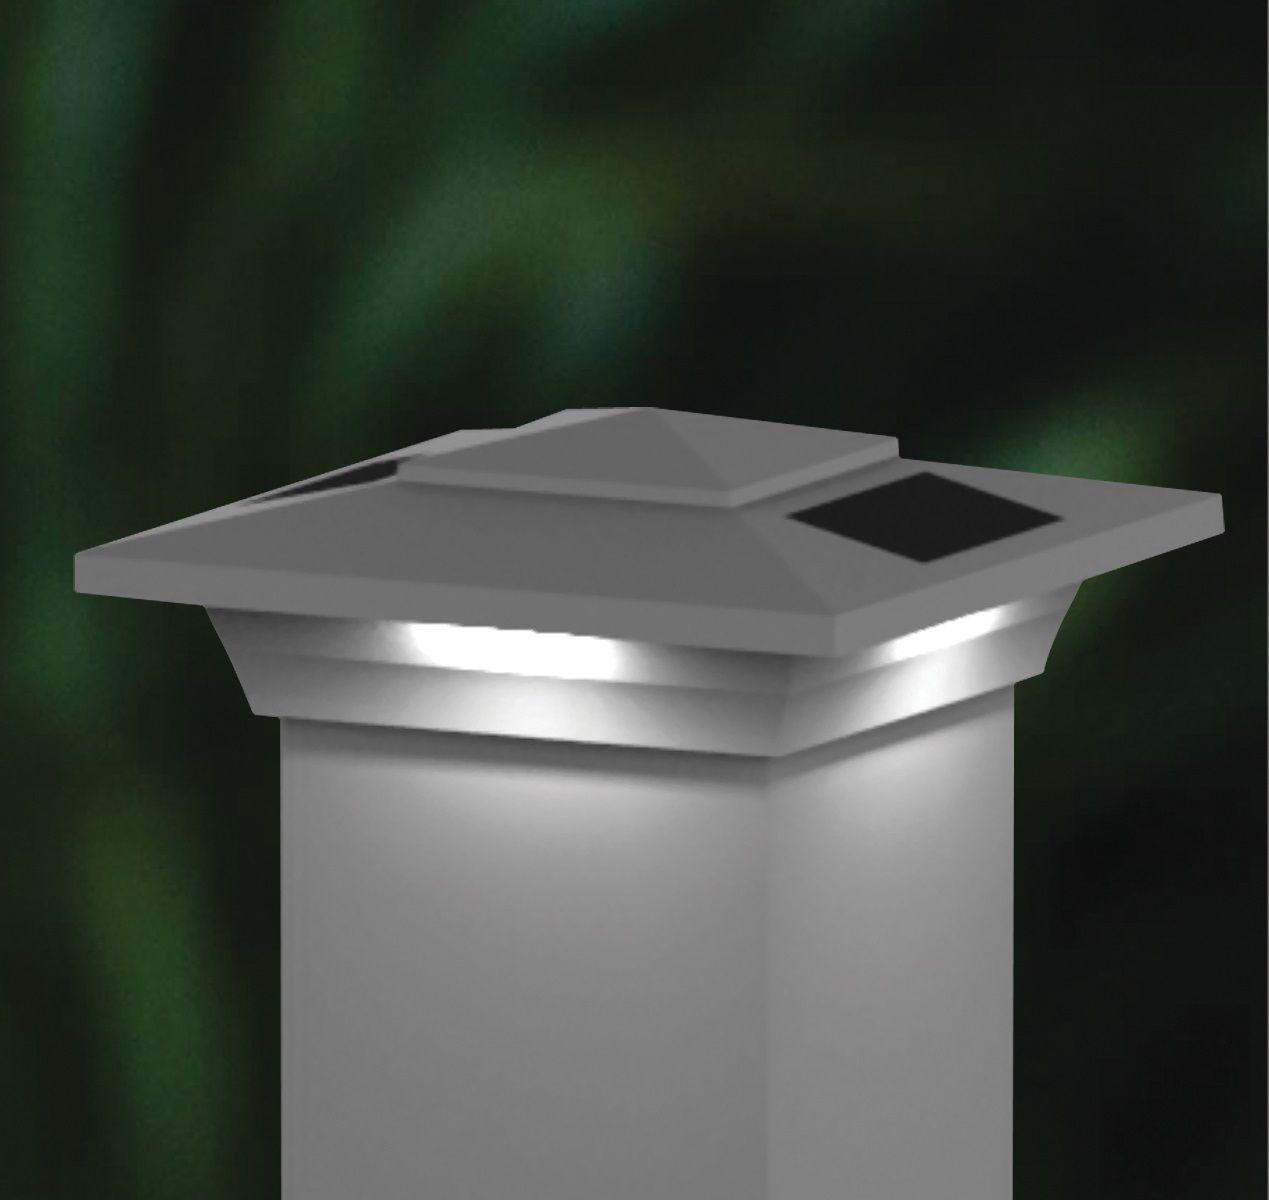 4x4 Solar Fence Post Cap Lights - White Low Profile ...